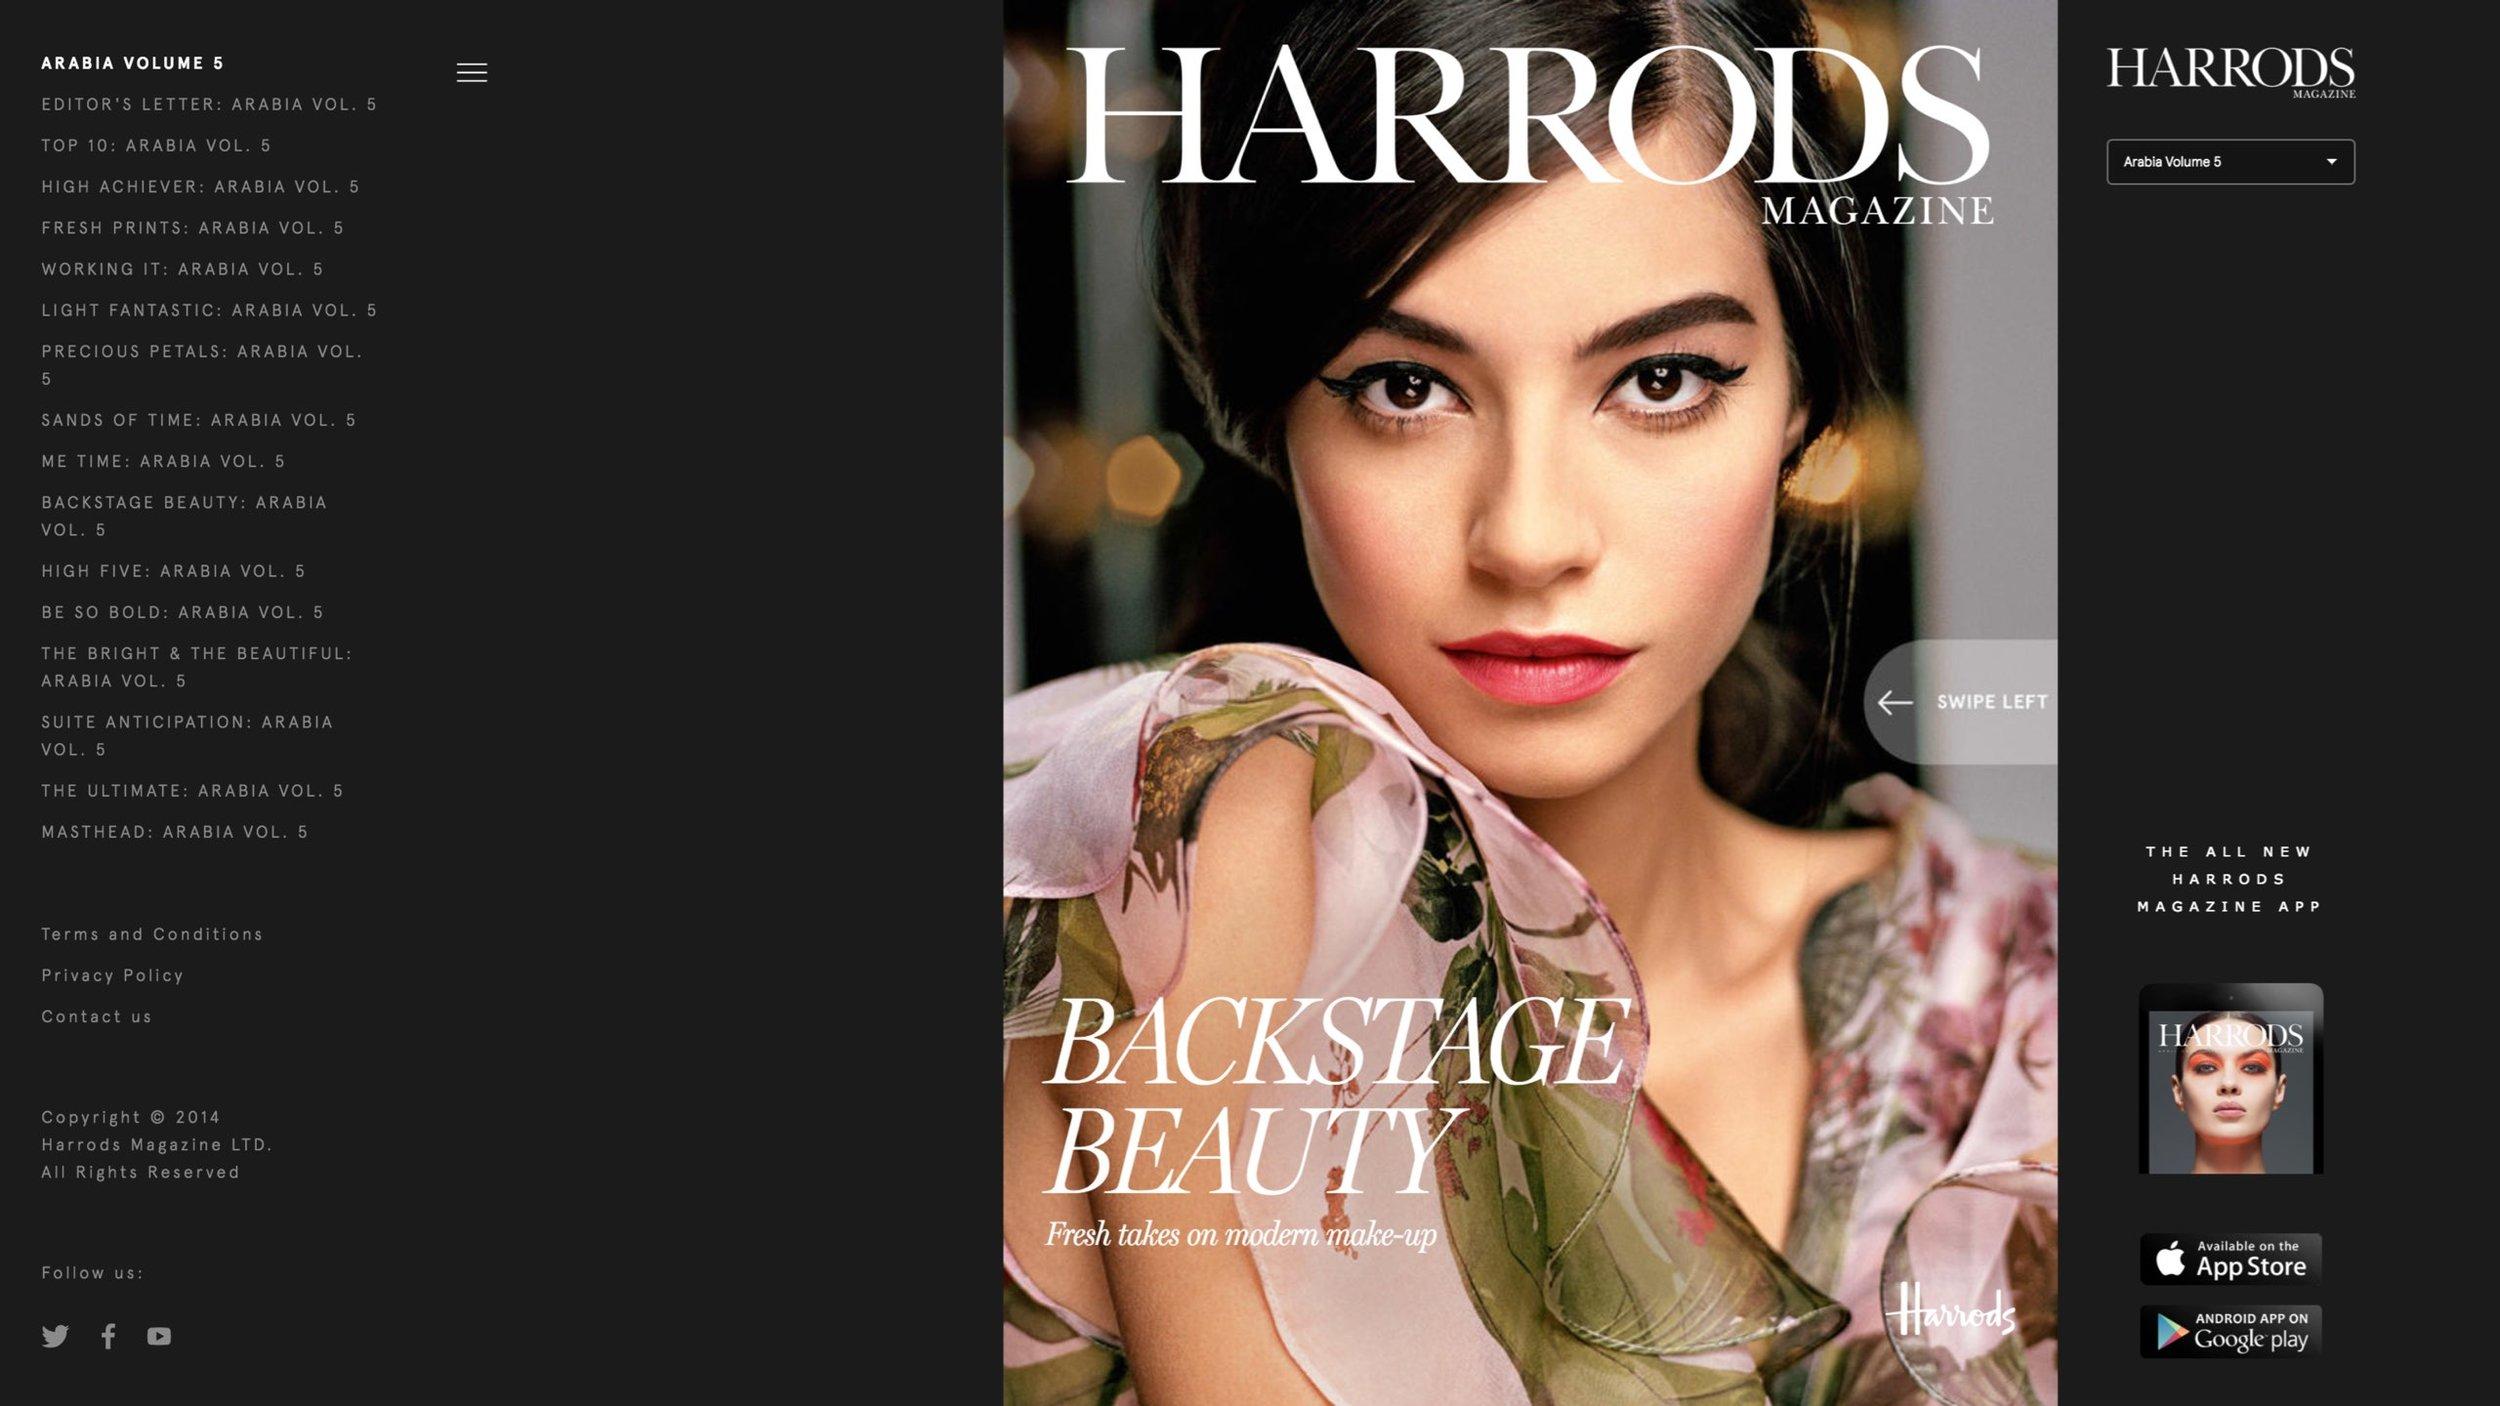 harrods_magazine_1.jpg